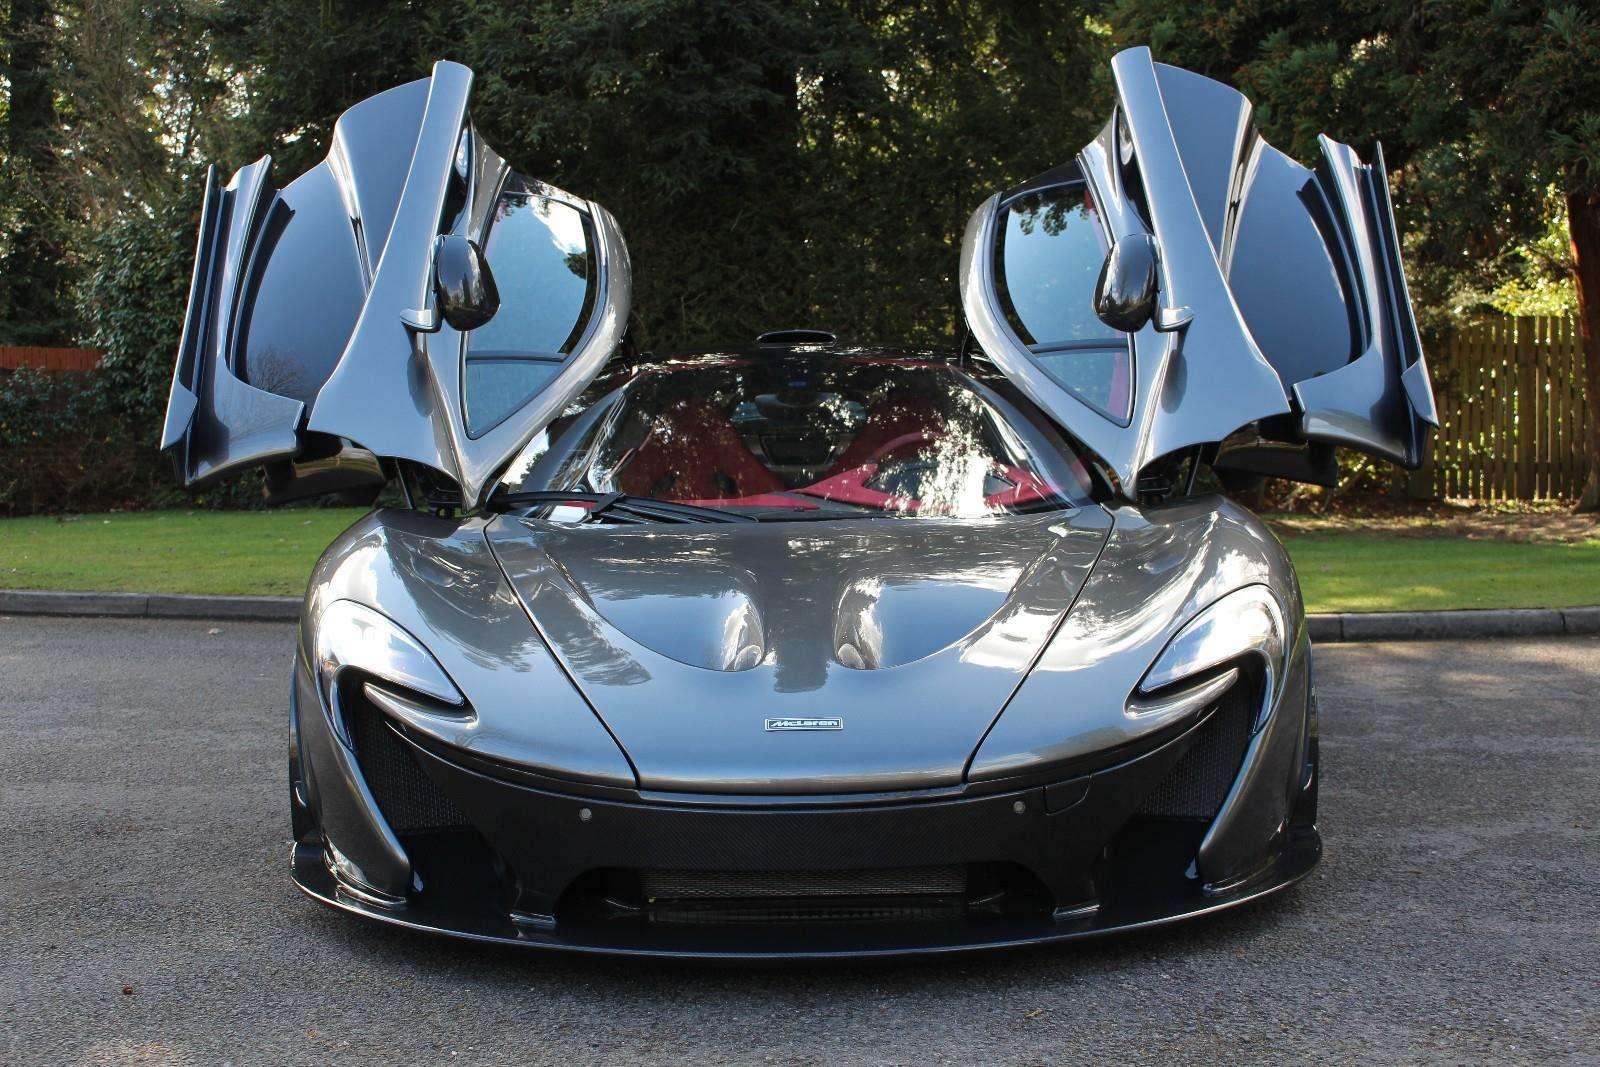 Mclaren P1 - Windsor Great Cars